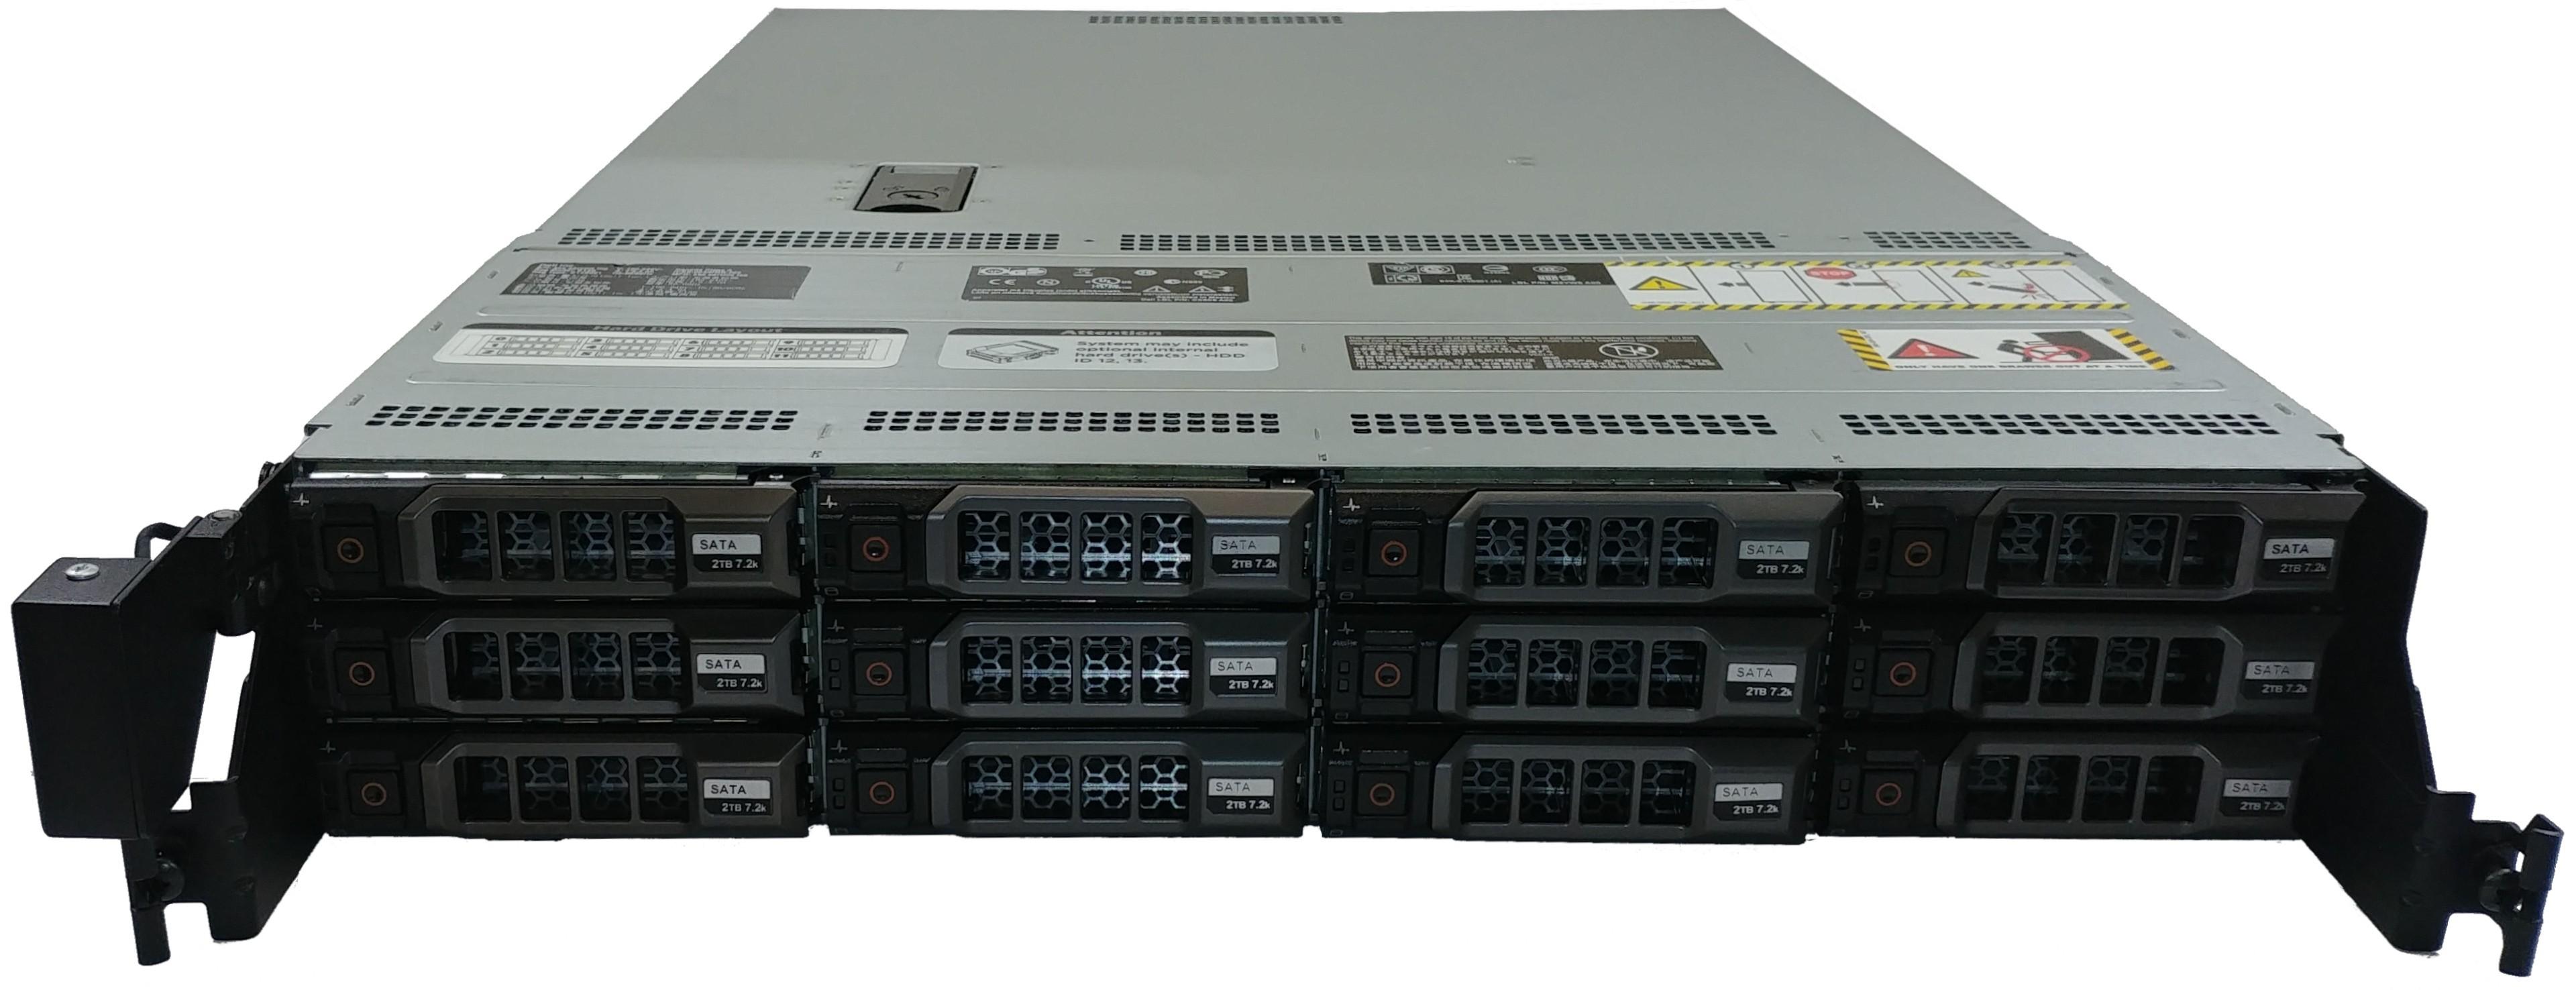 New Dell PowerEdge R510 Hot Swap 2TB 7.2K 6G SATA Hard Drive 1 Year Warranty